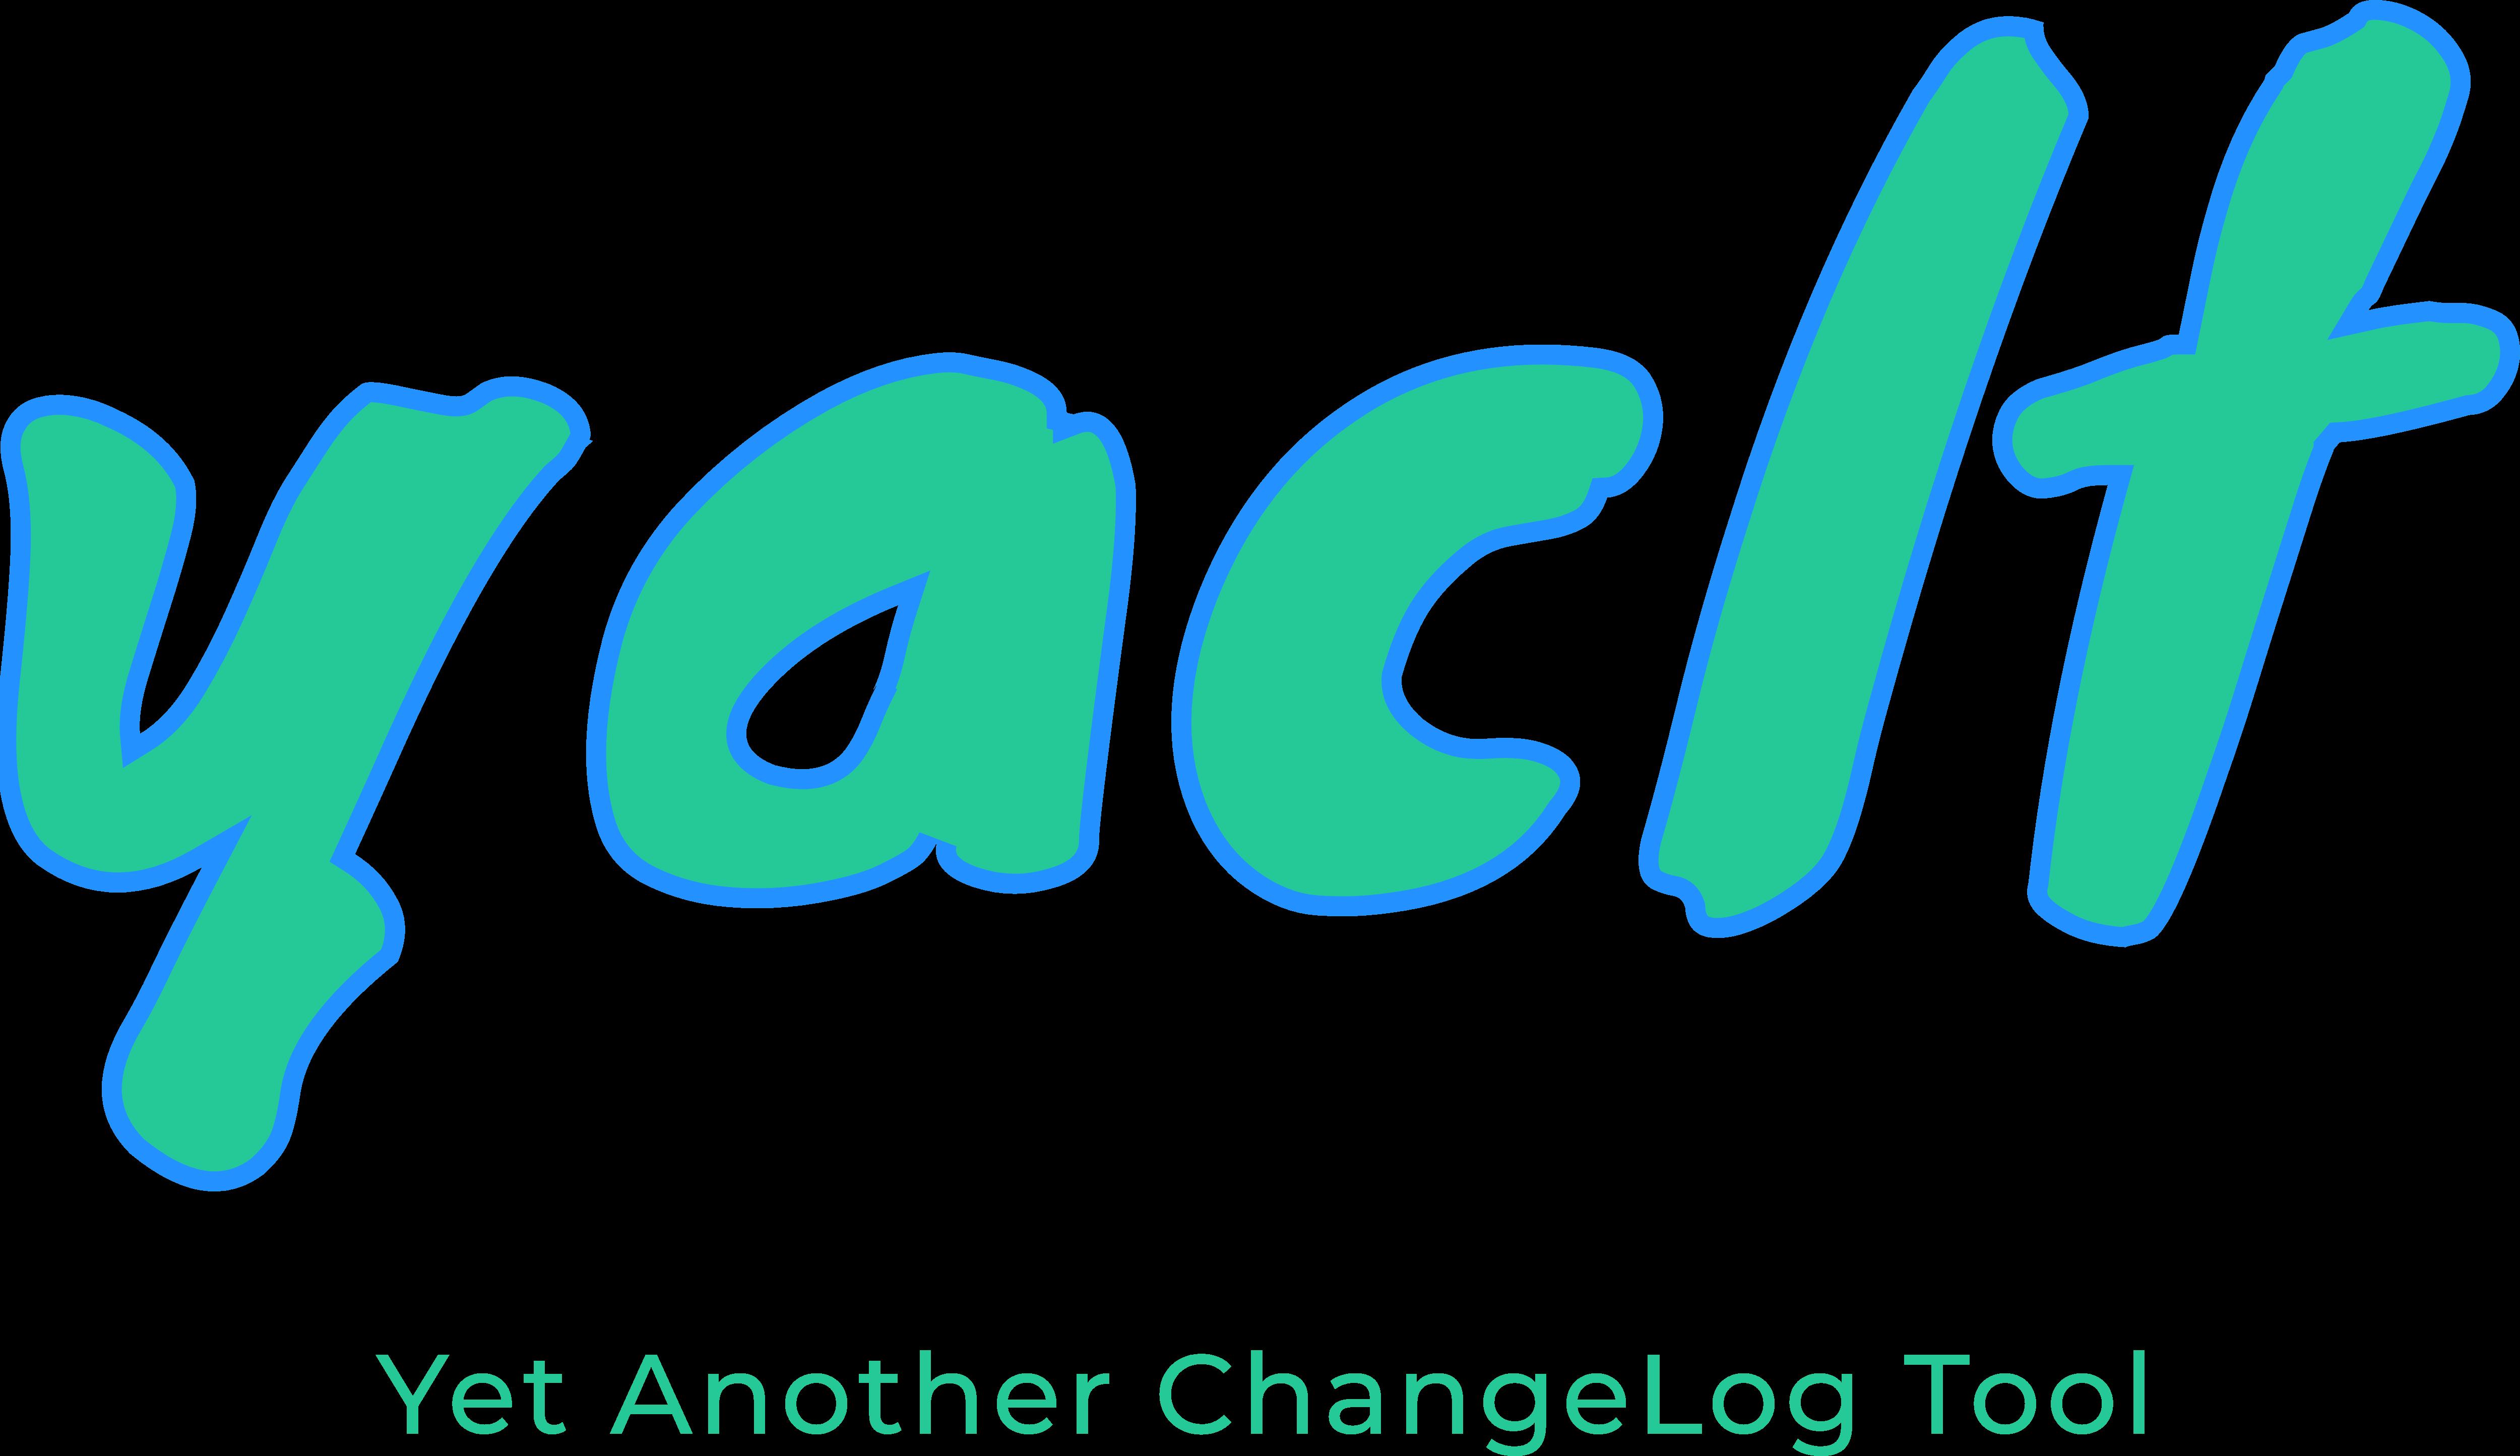 yaclt logo